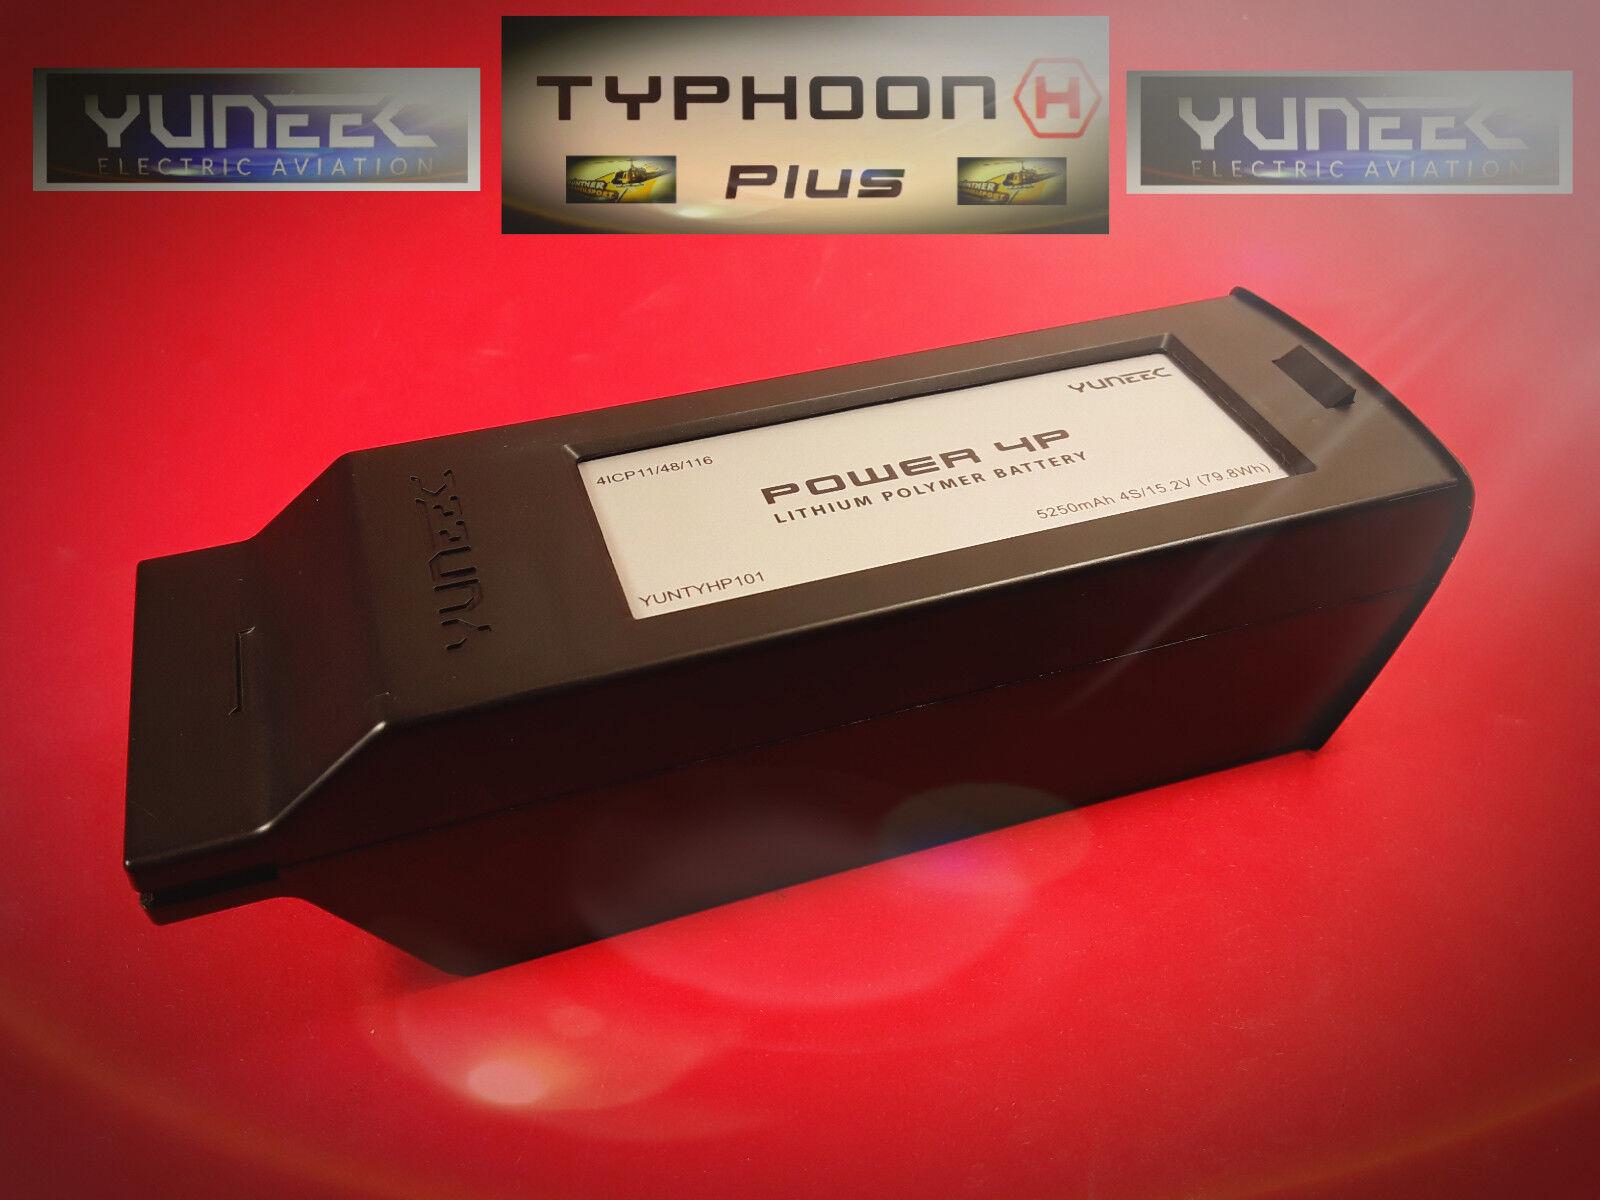 TYPHOON H Plus BATTERIA 5250mah/15, 2v 4s, N.: yuntyhp 101 di yuneec IN MAGAZZINO